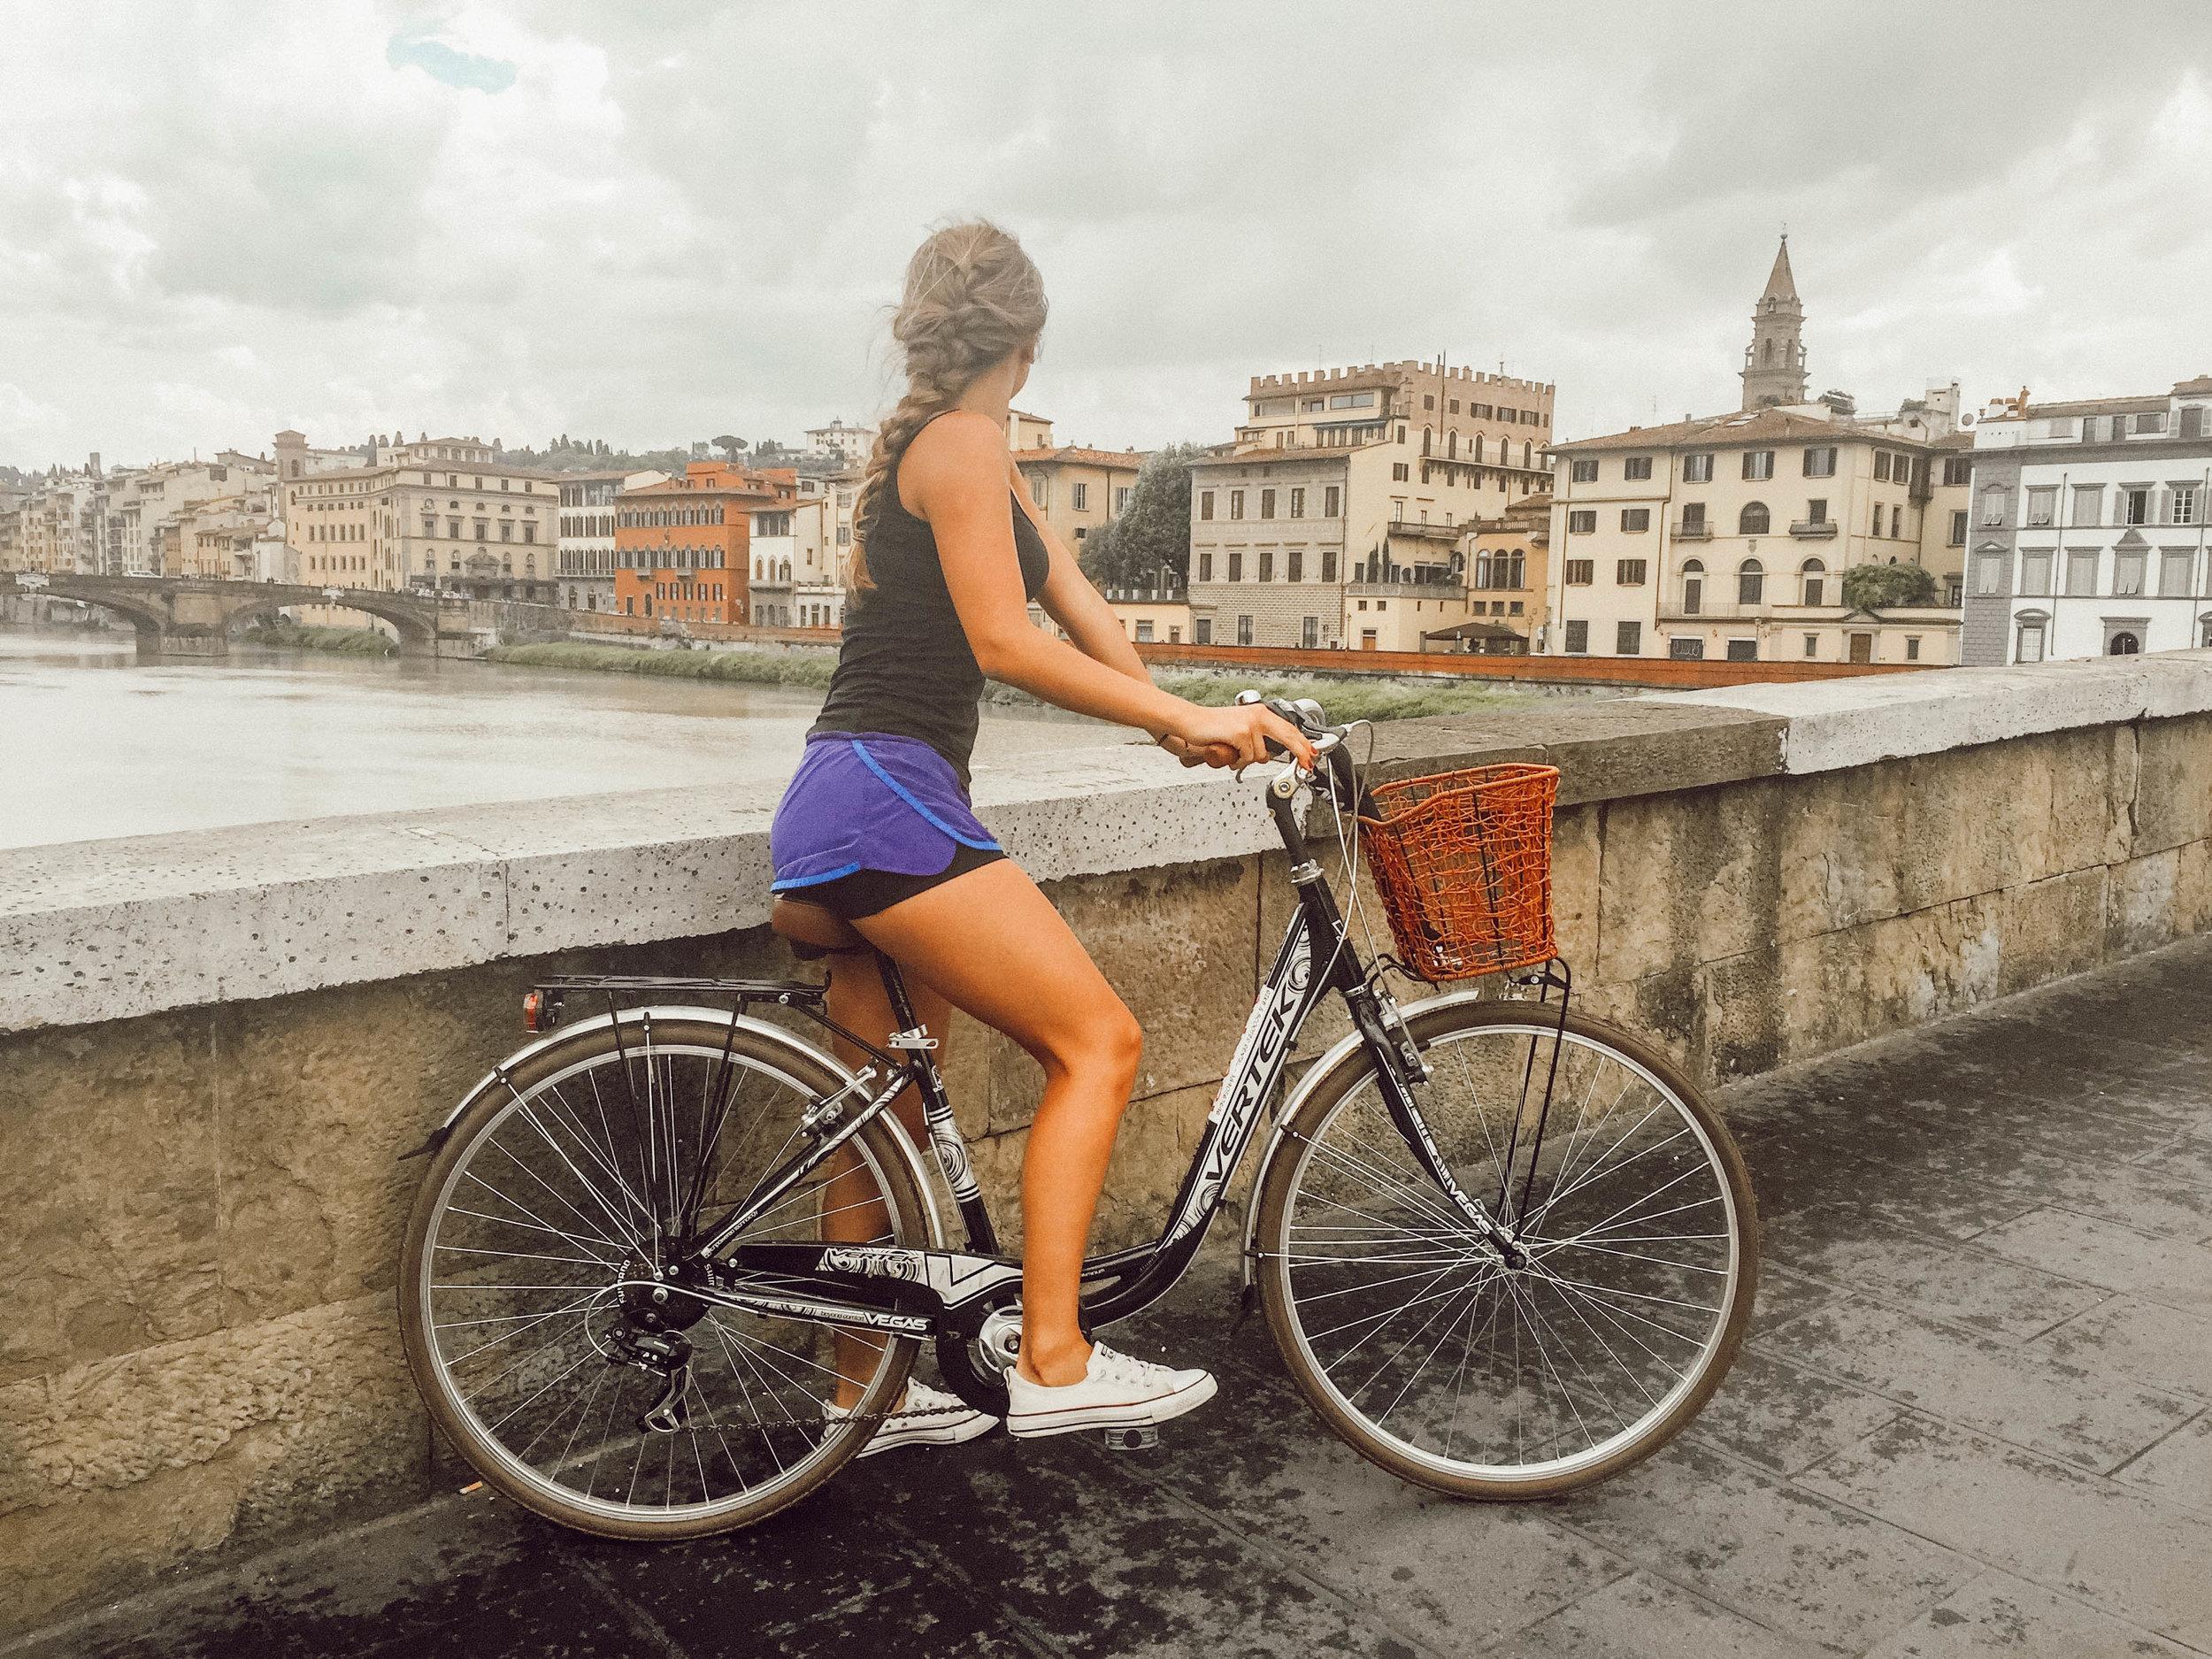 Bike through the city